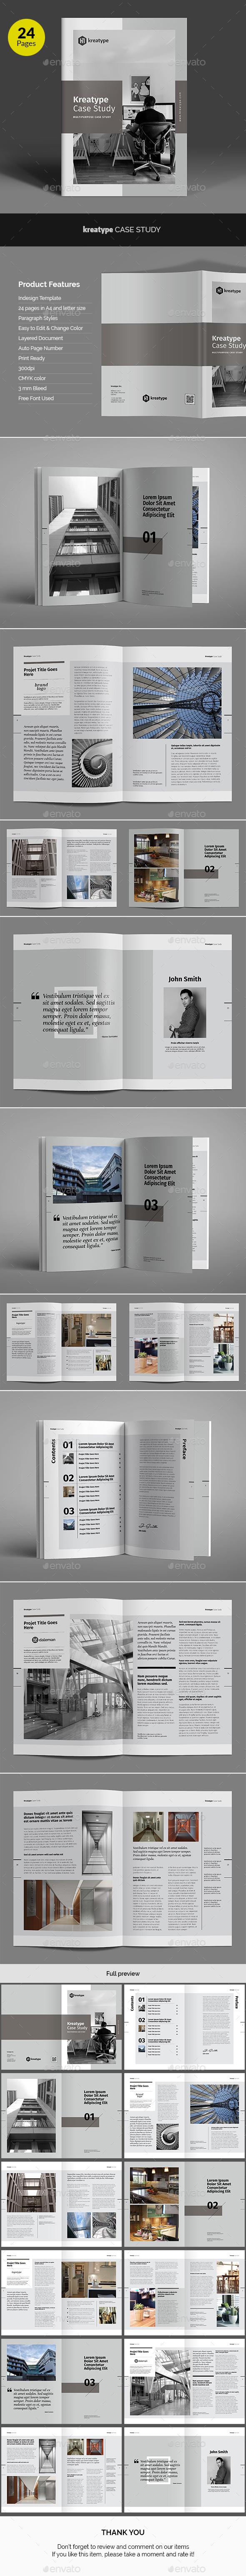 Kreatype Case Study | Brochure template, Brochures and Template